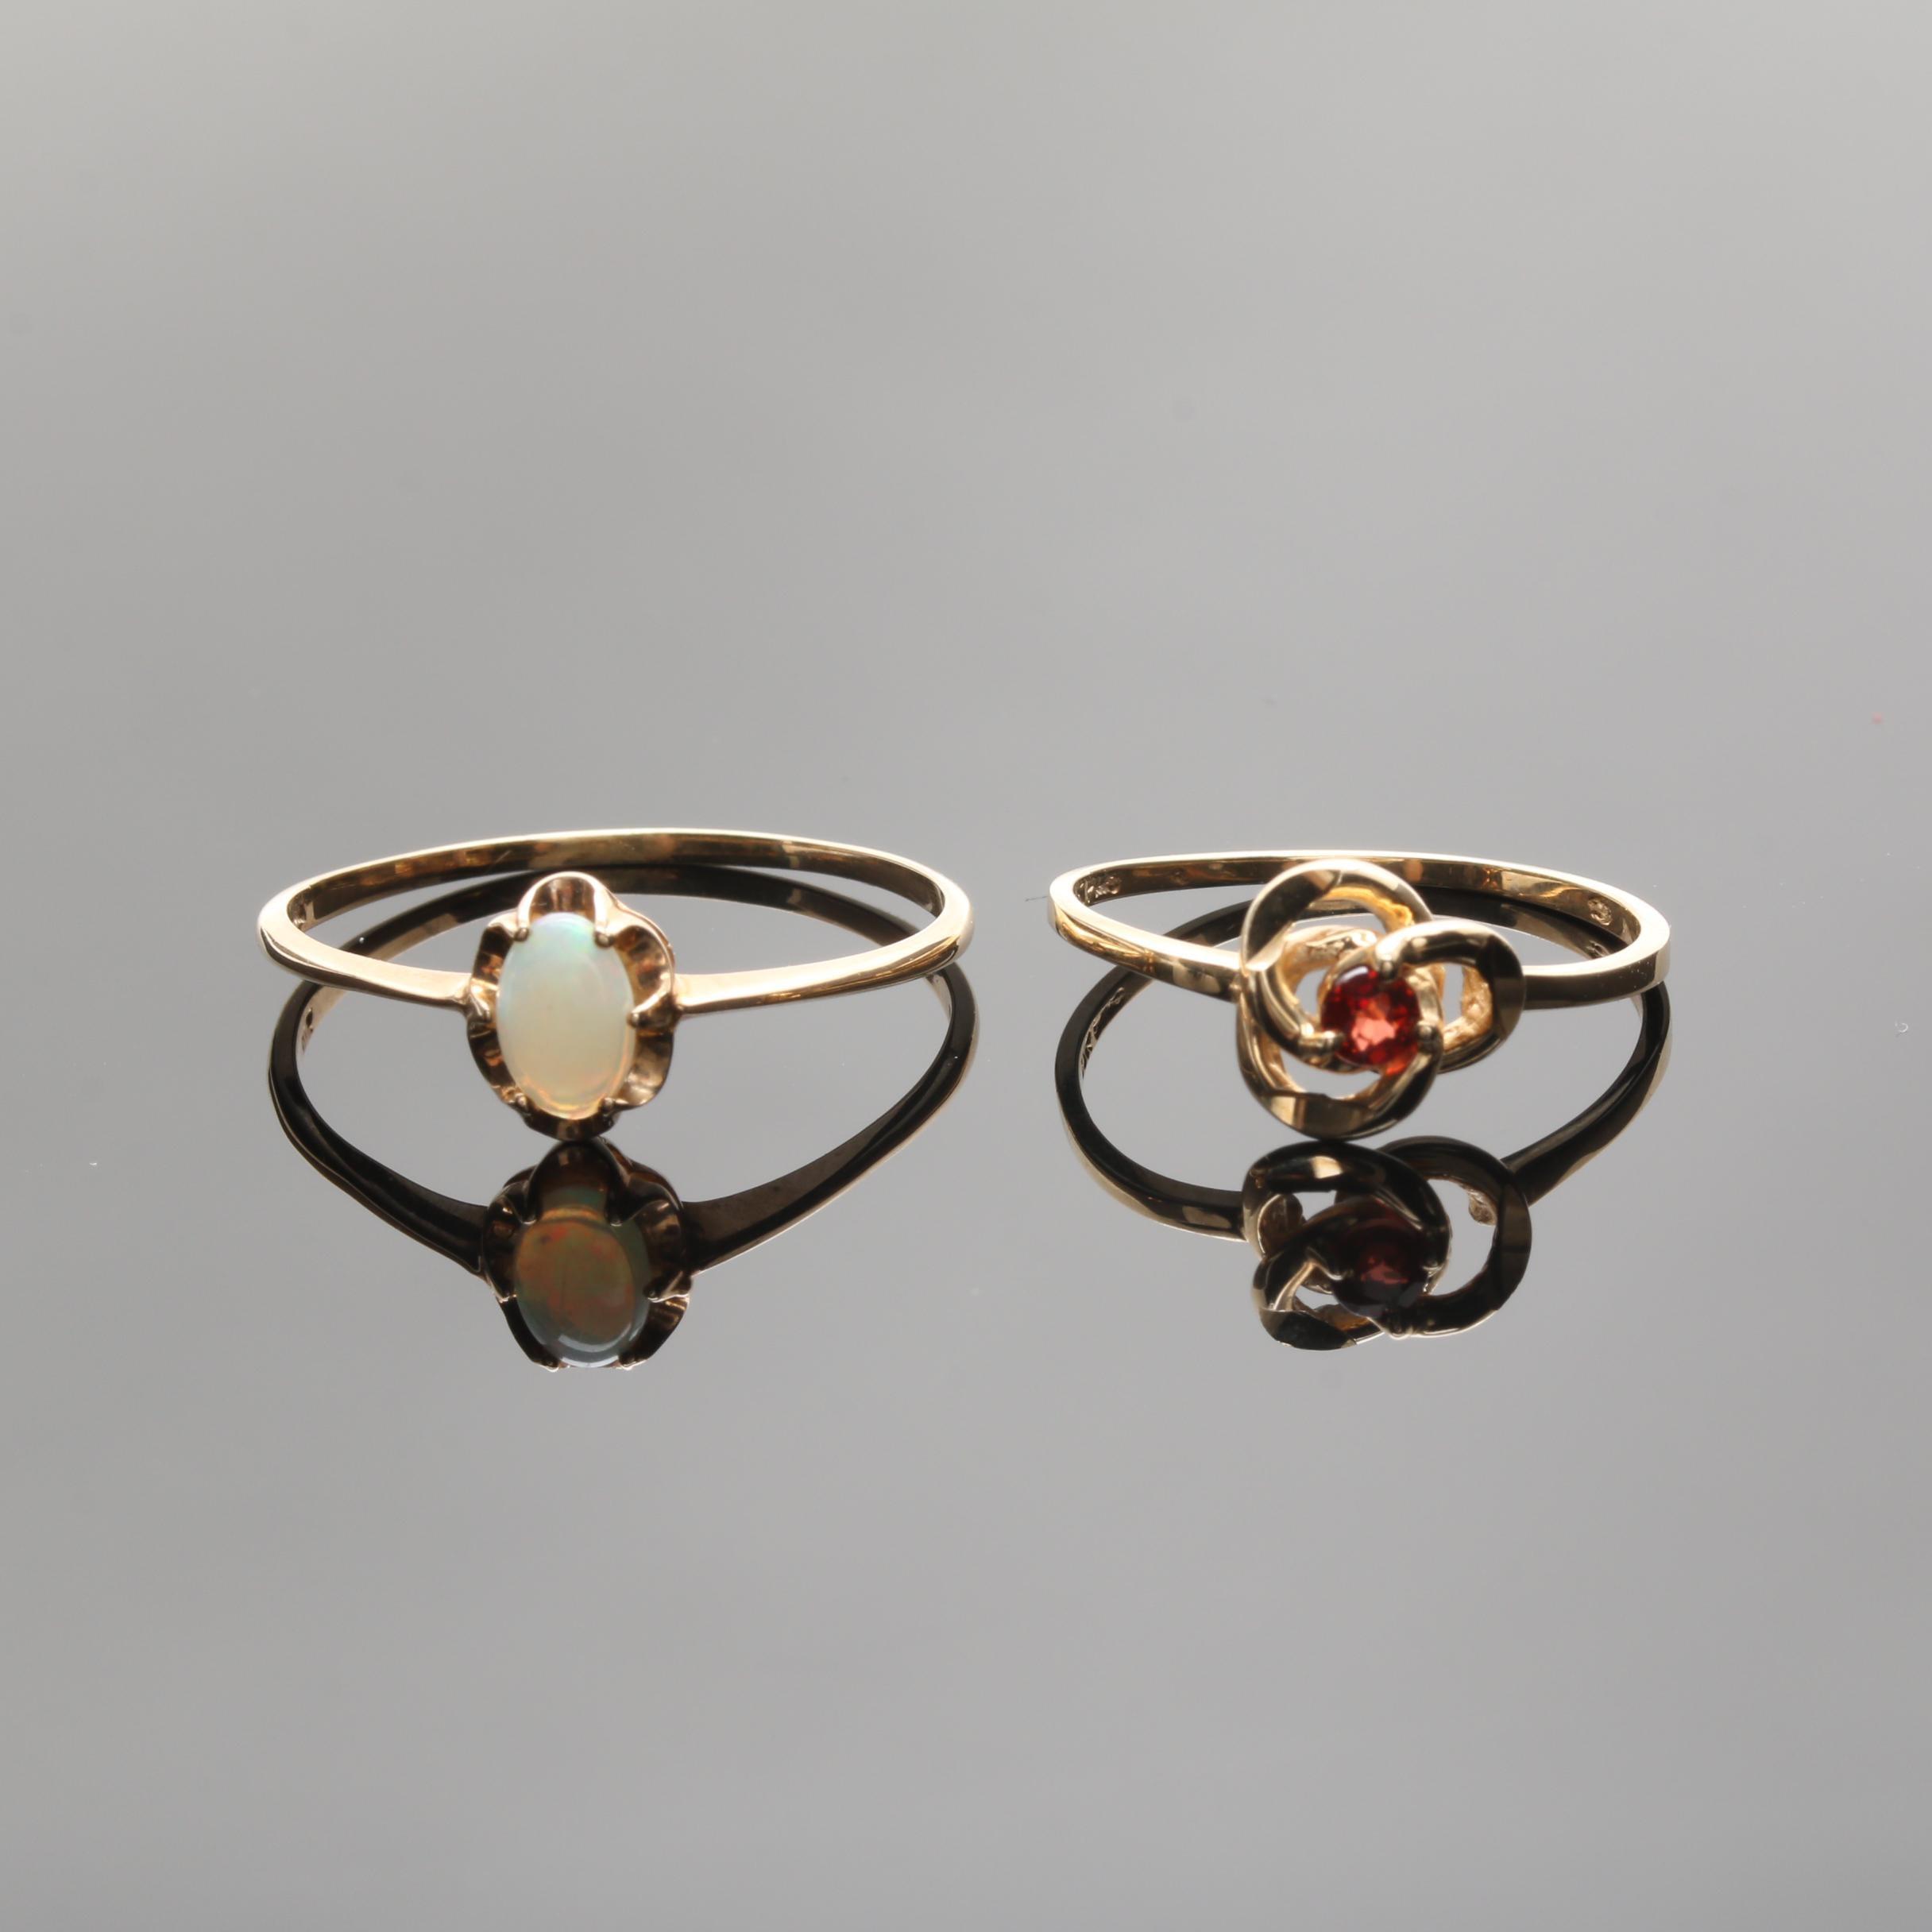 10K Yellow Gold Opal and Garnet Rings